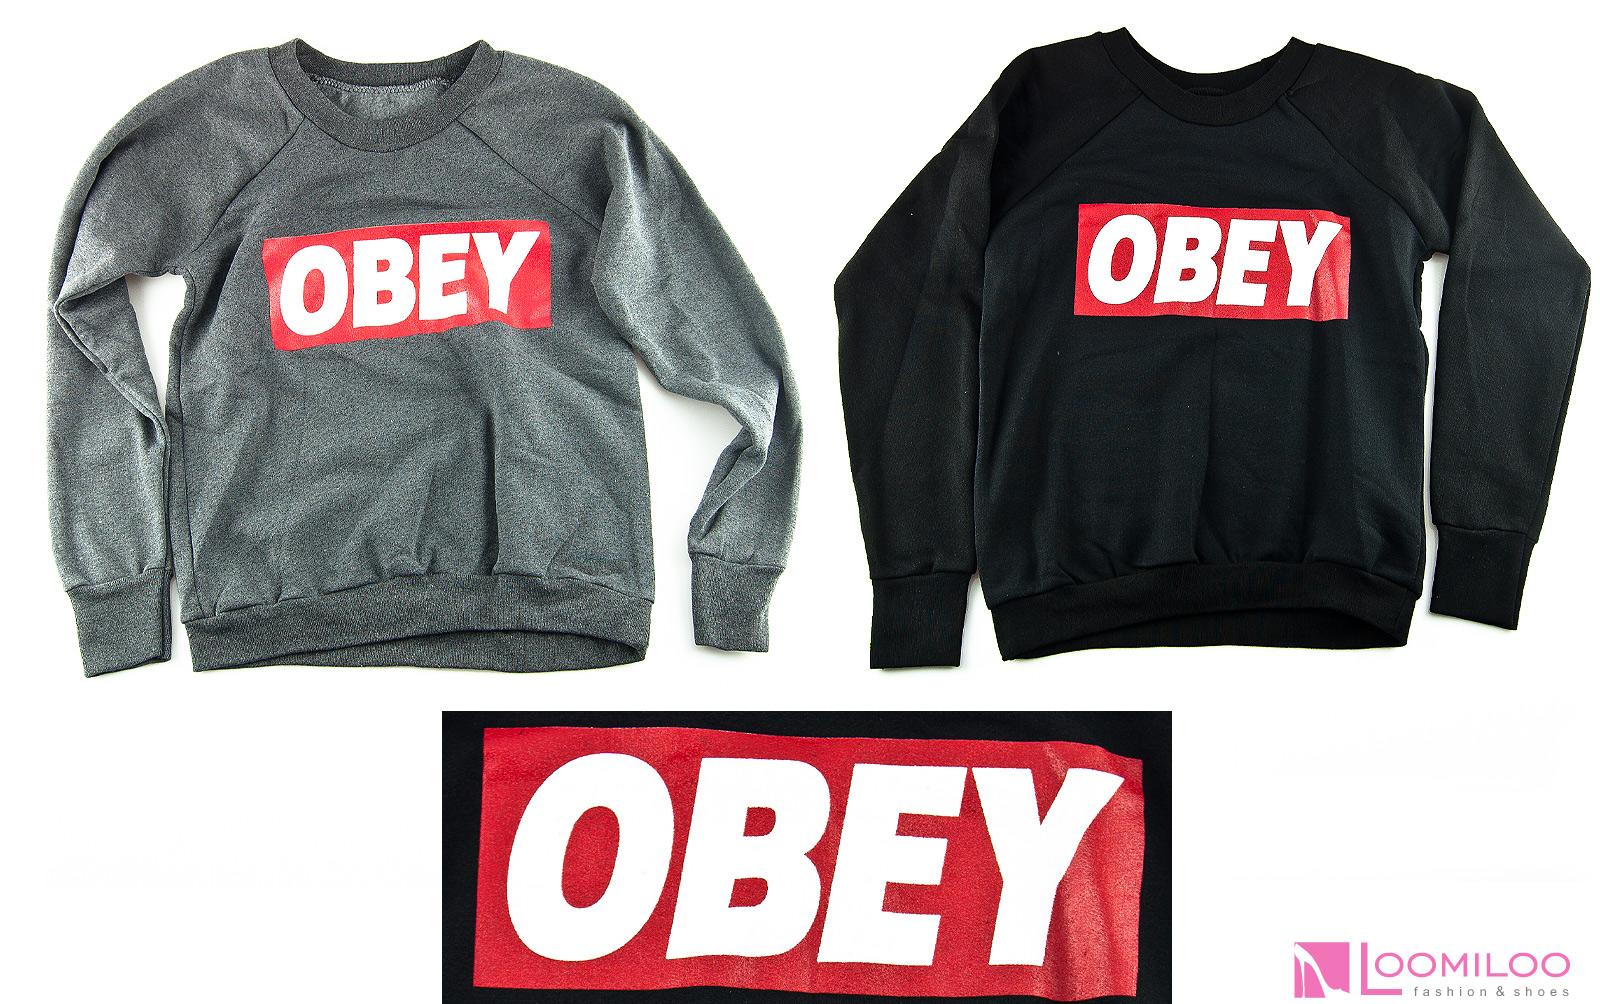 OBEY Sweater Sweatshirt Pulli Pullover Damen Kanye Yolo Hipster Swag | eBay